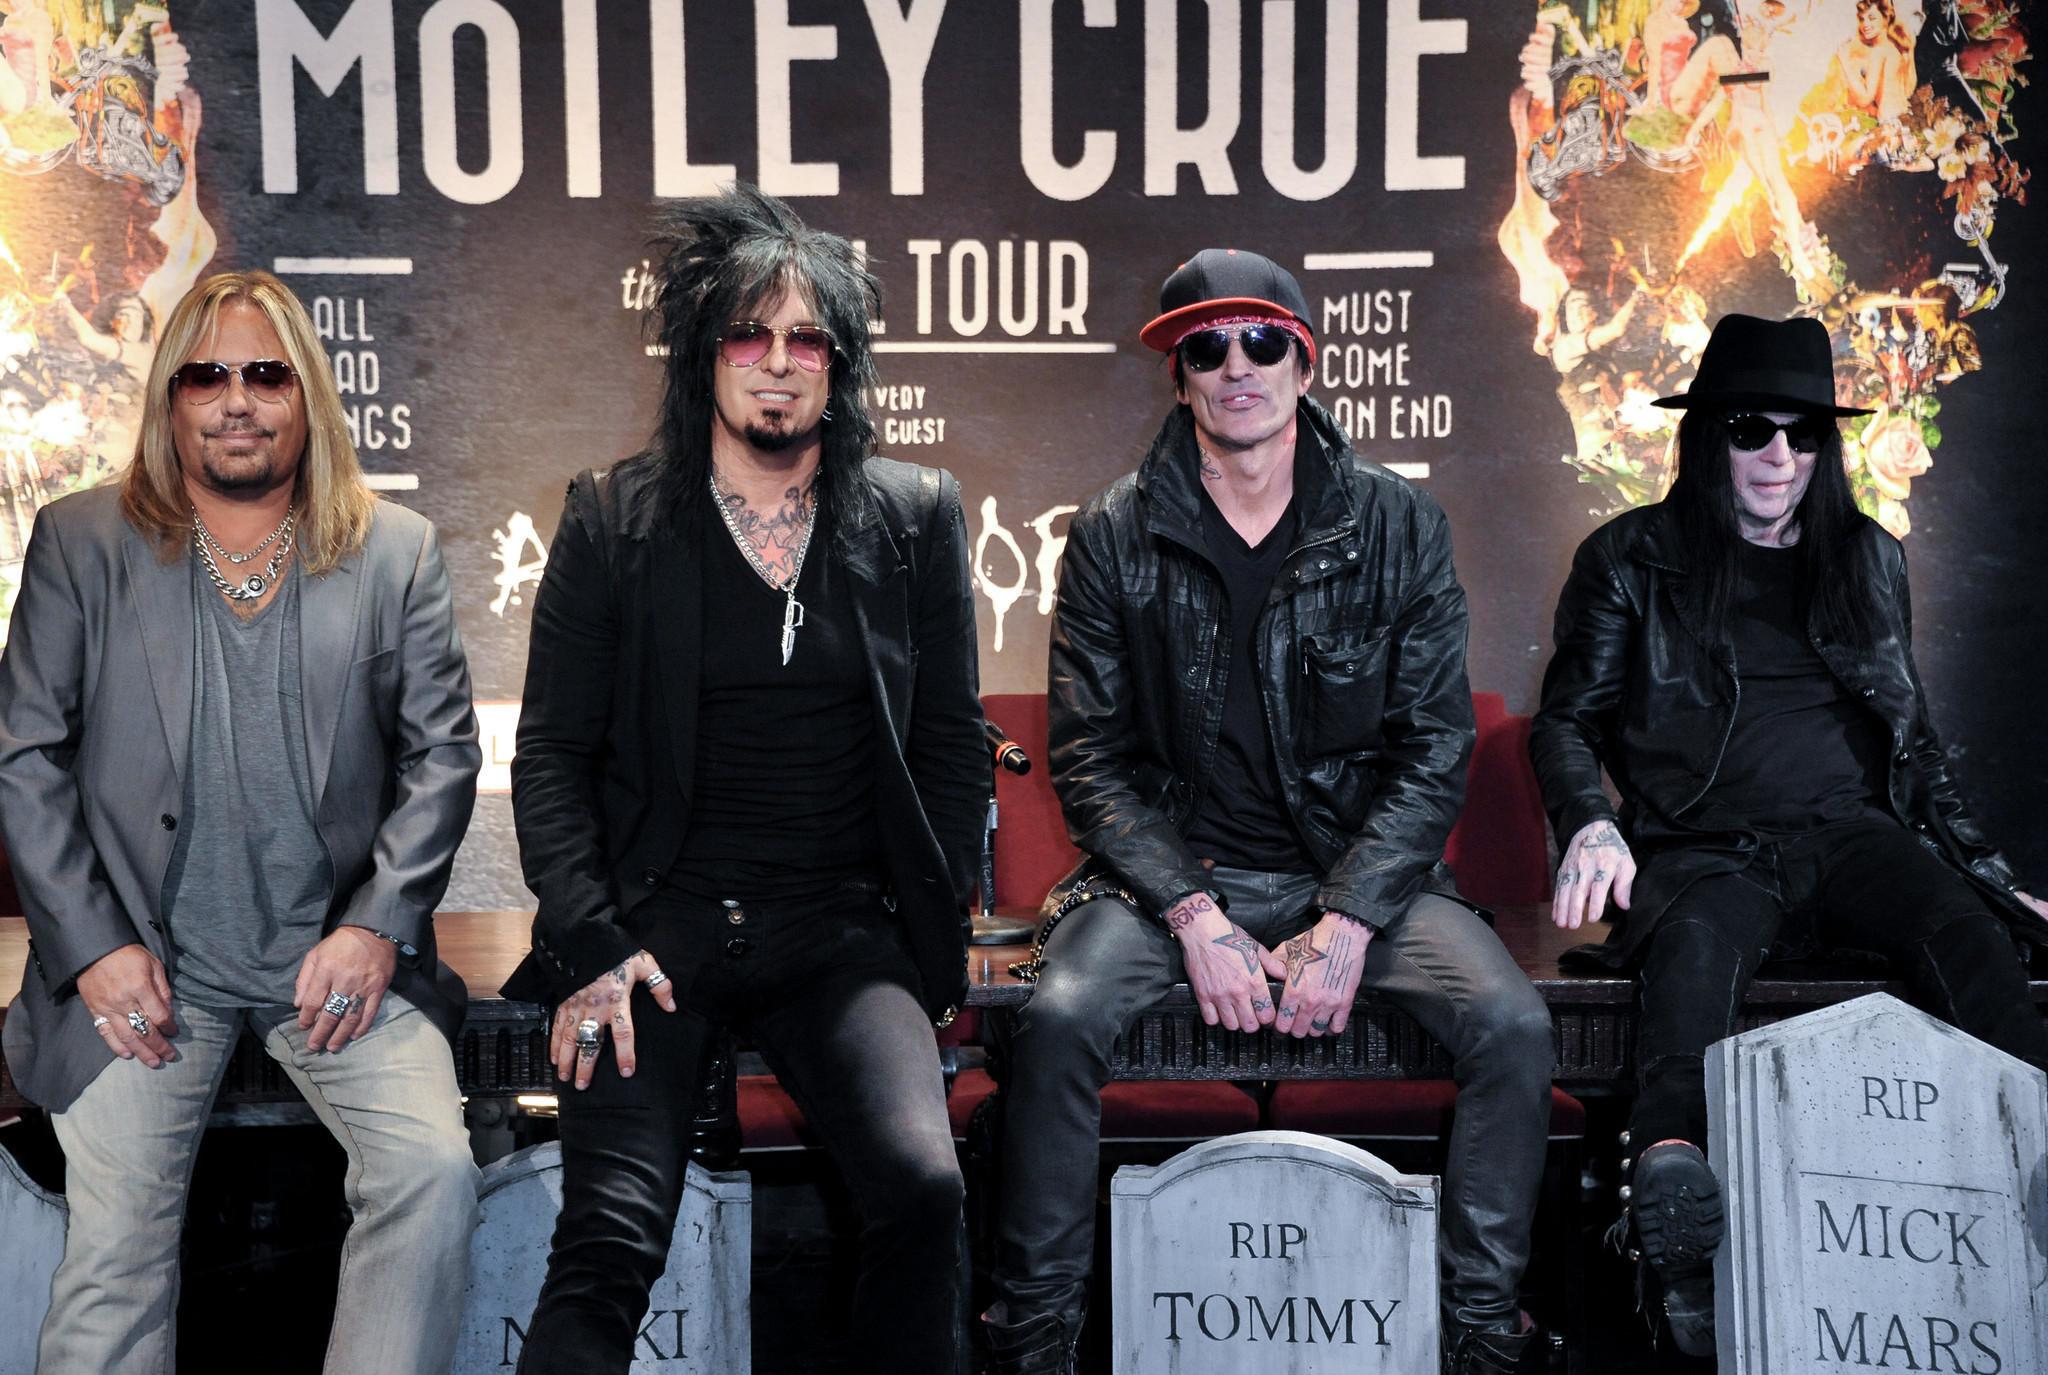 mötley crüe photos download final tour